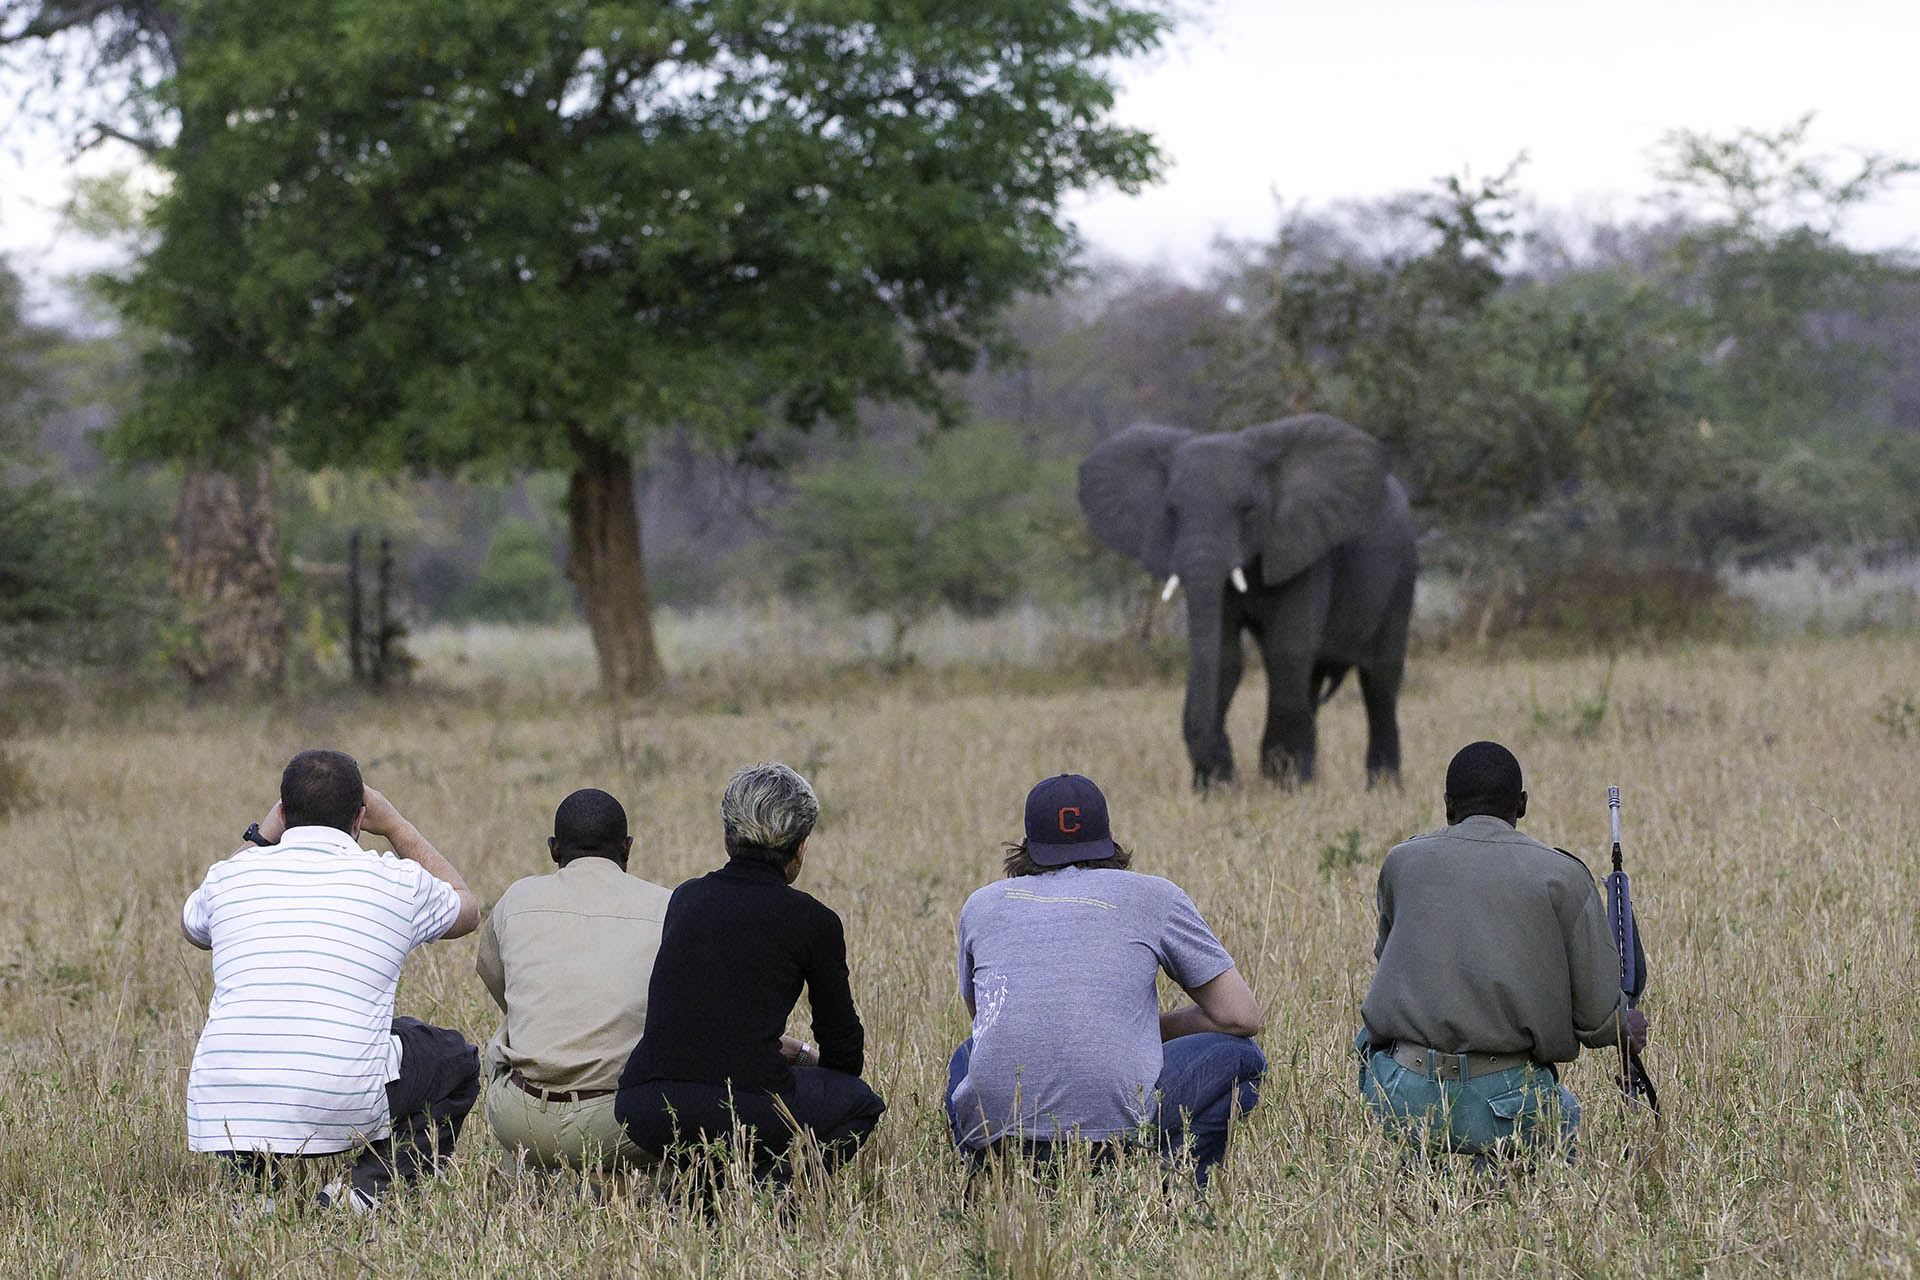 liwonde national park malawi-national-parks-reserves-malawian-style-malawi-adventures-experiences-holidays-specialist-tour-operator-mvuu-walking-safari-liwonde